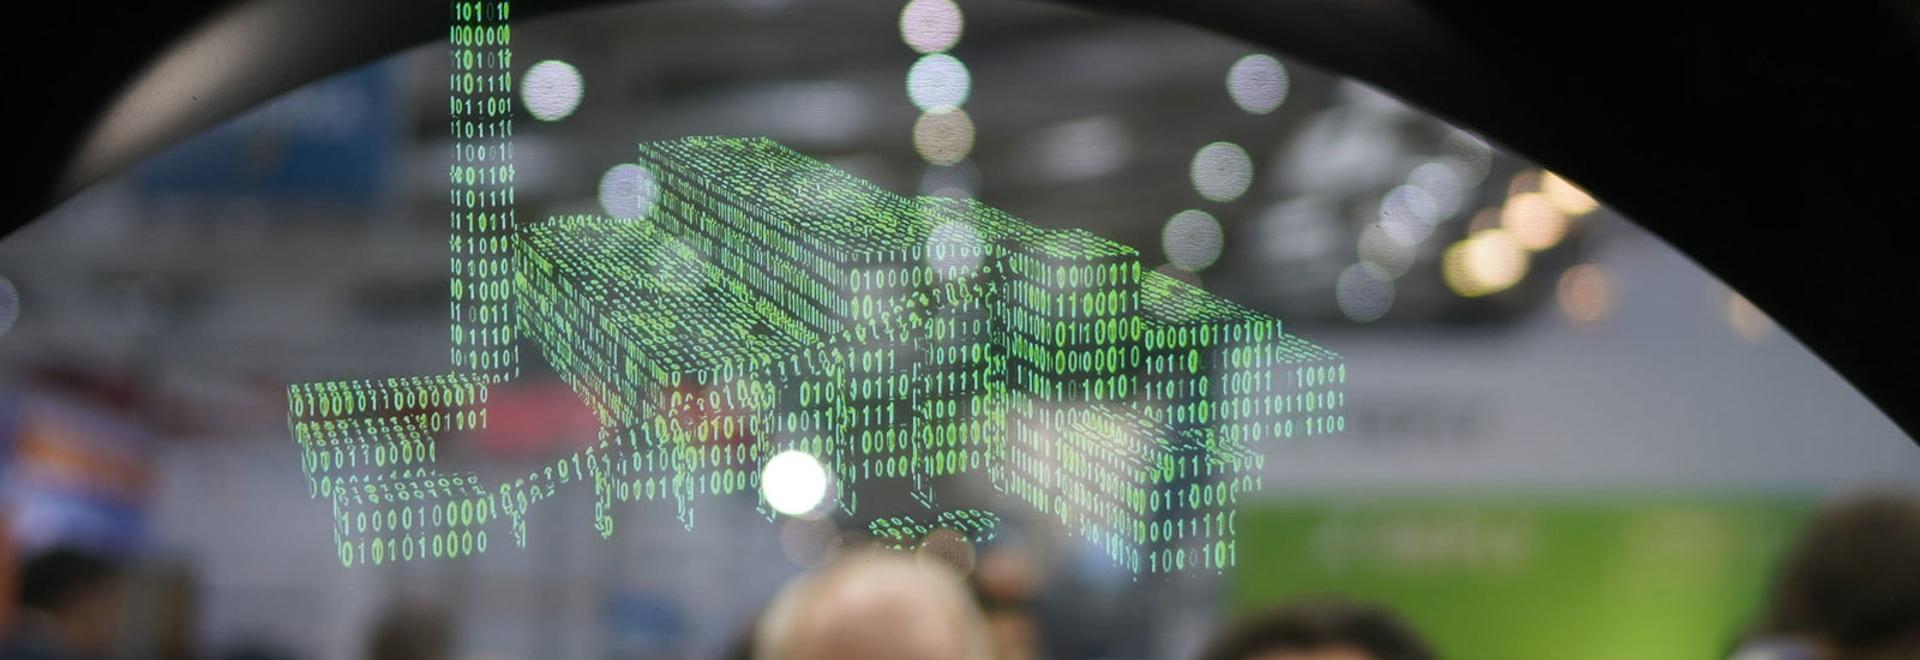 L'intelligence artificielle : Menace ou fantasme ?